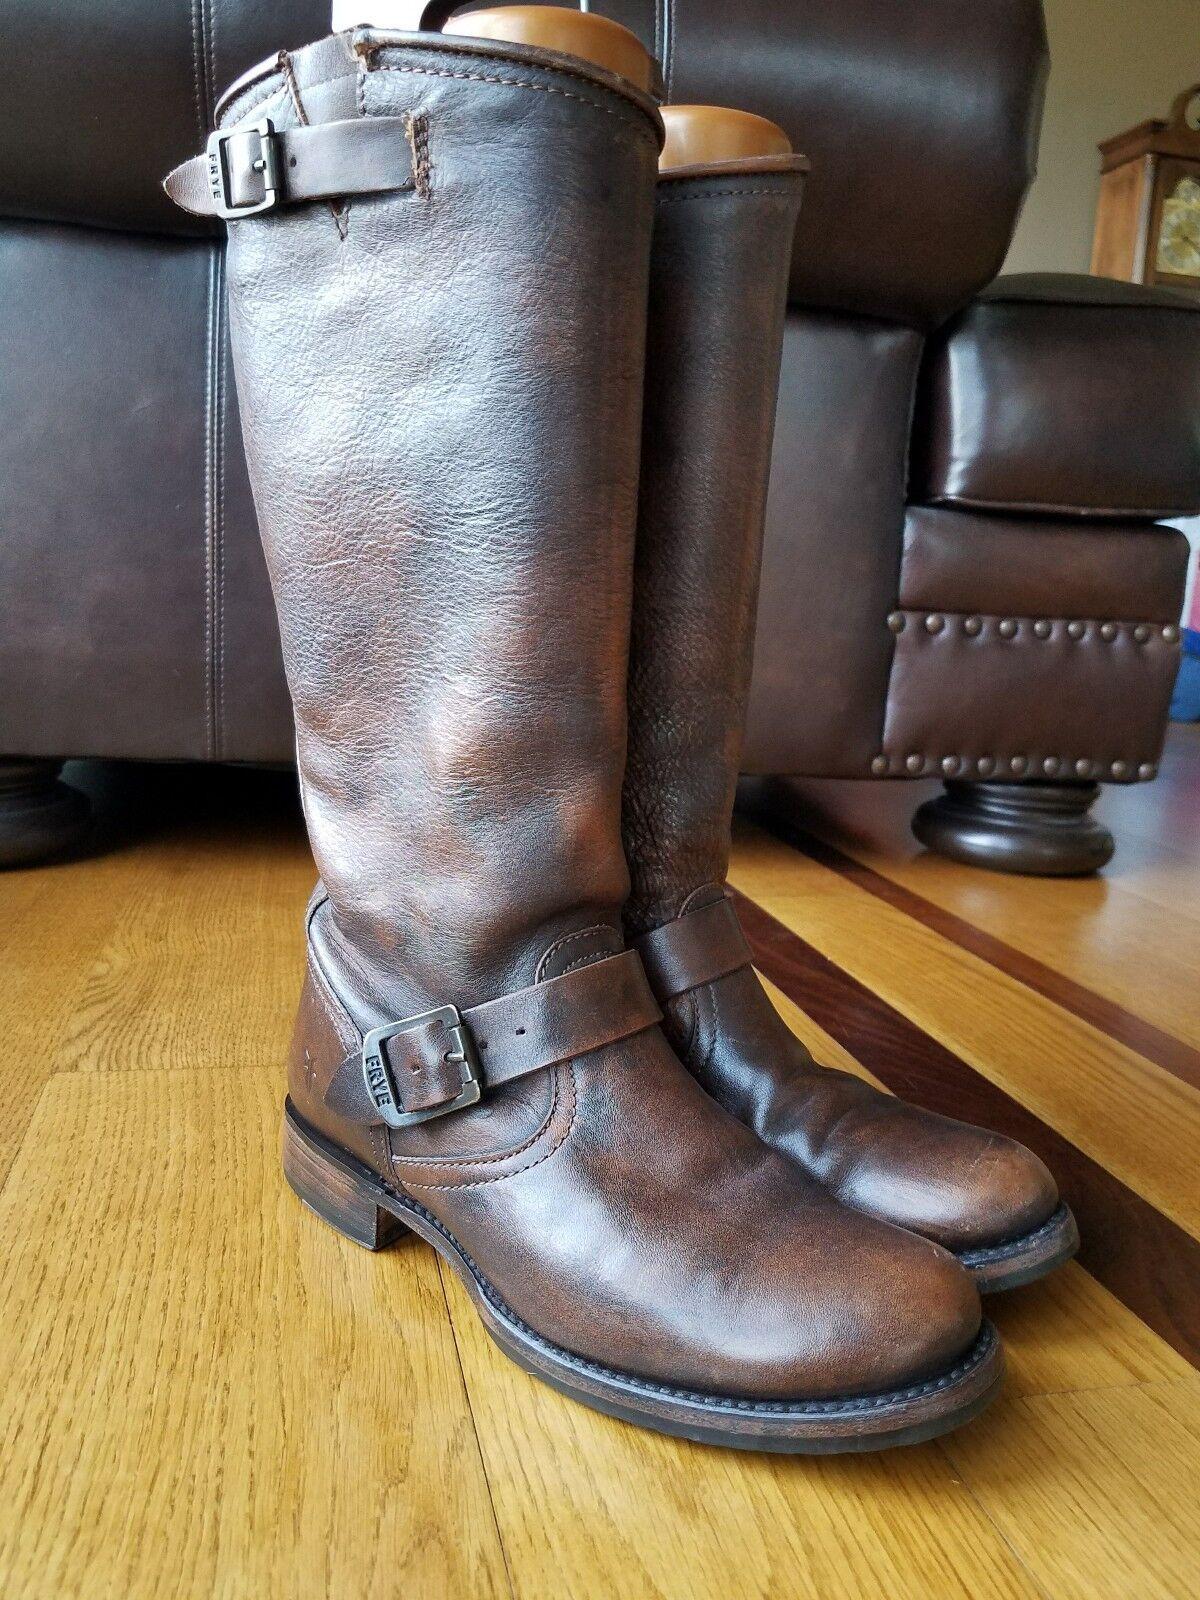 Frye Veronica para para para Mujer de Cuero Marrón botas De Montar a Caballo de alto Slouch Hebilla de campus 9 9.5  mas barato